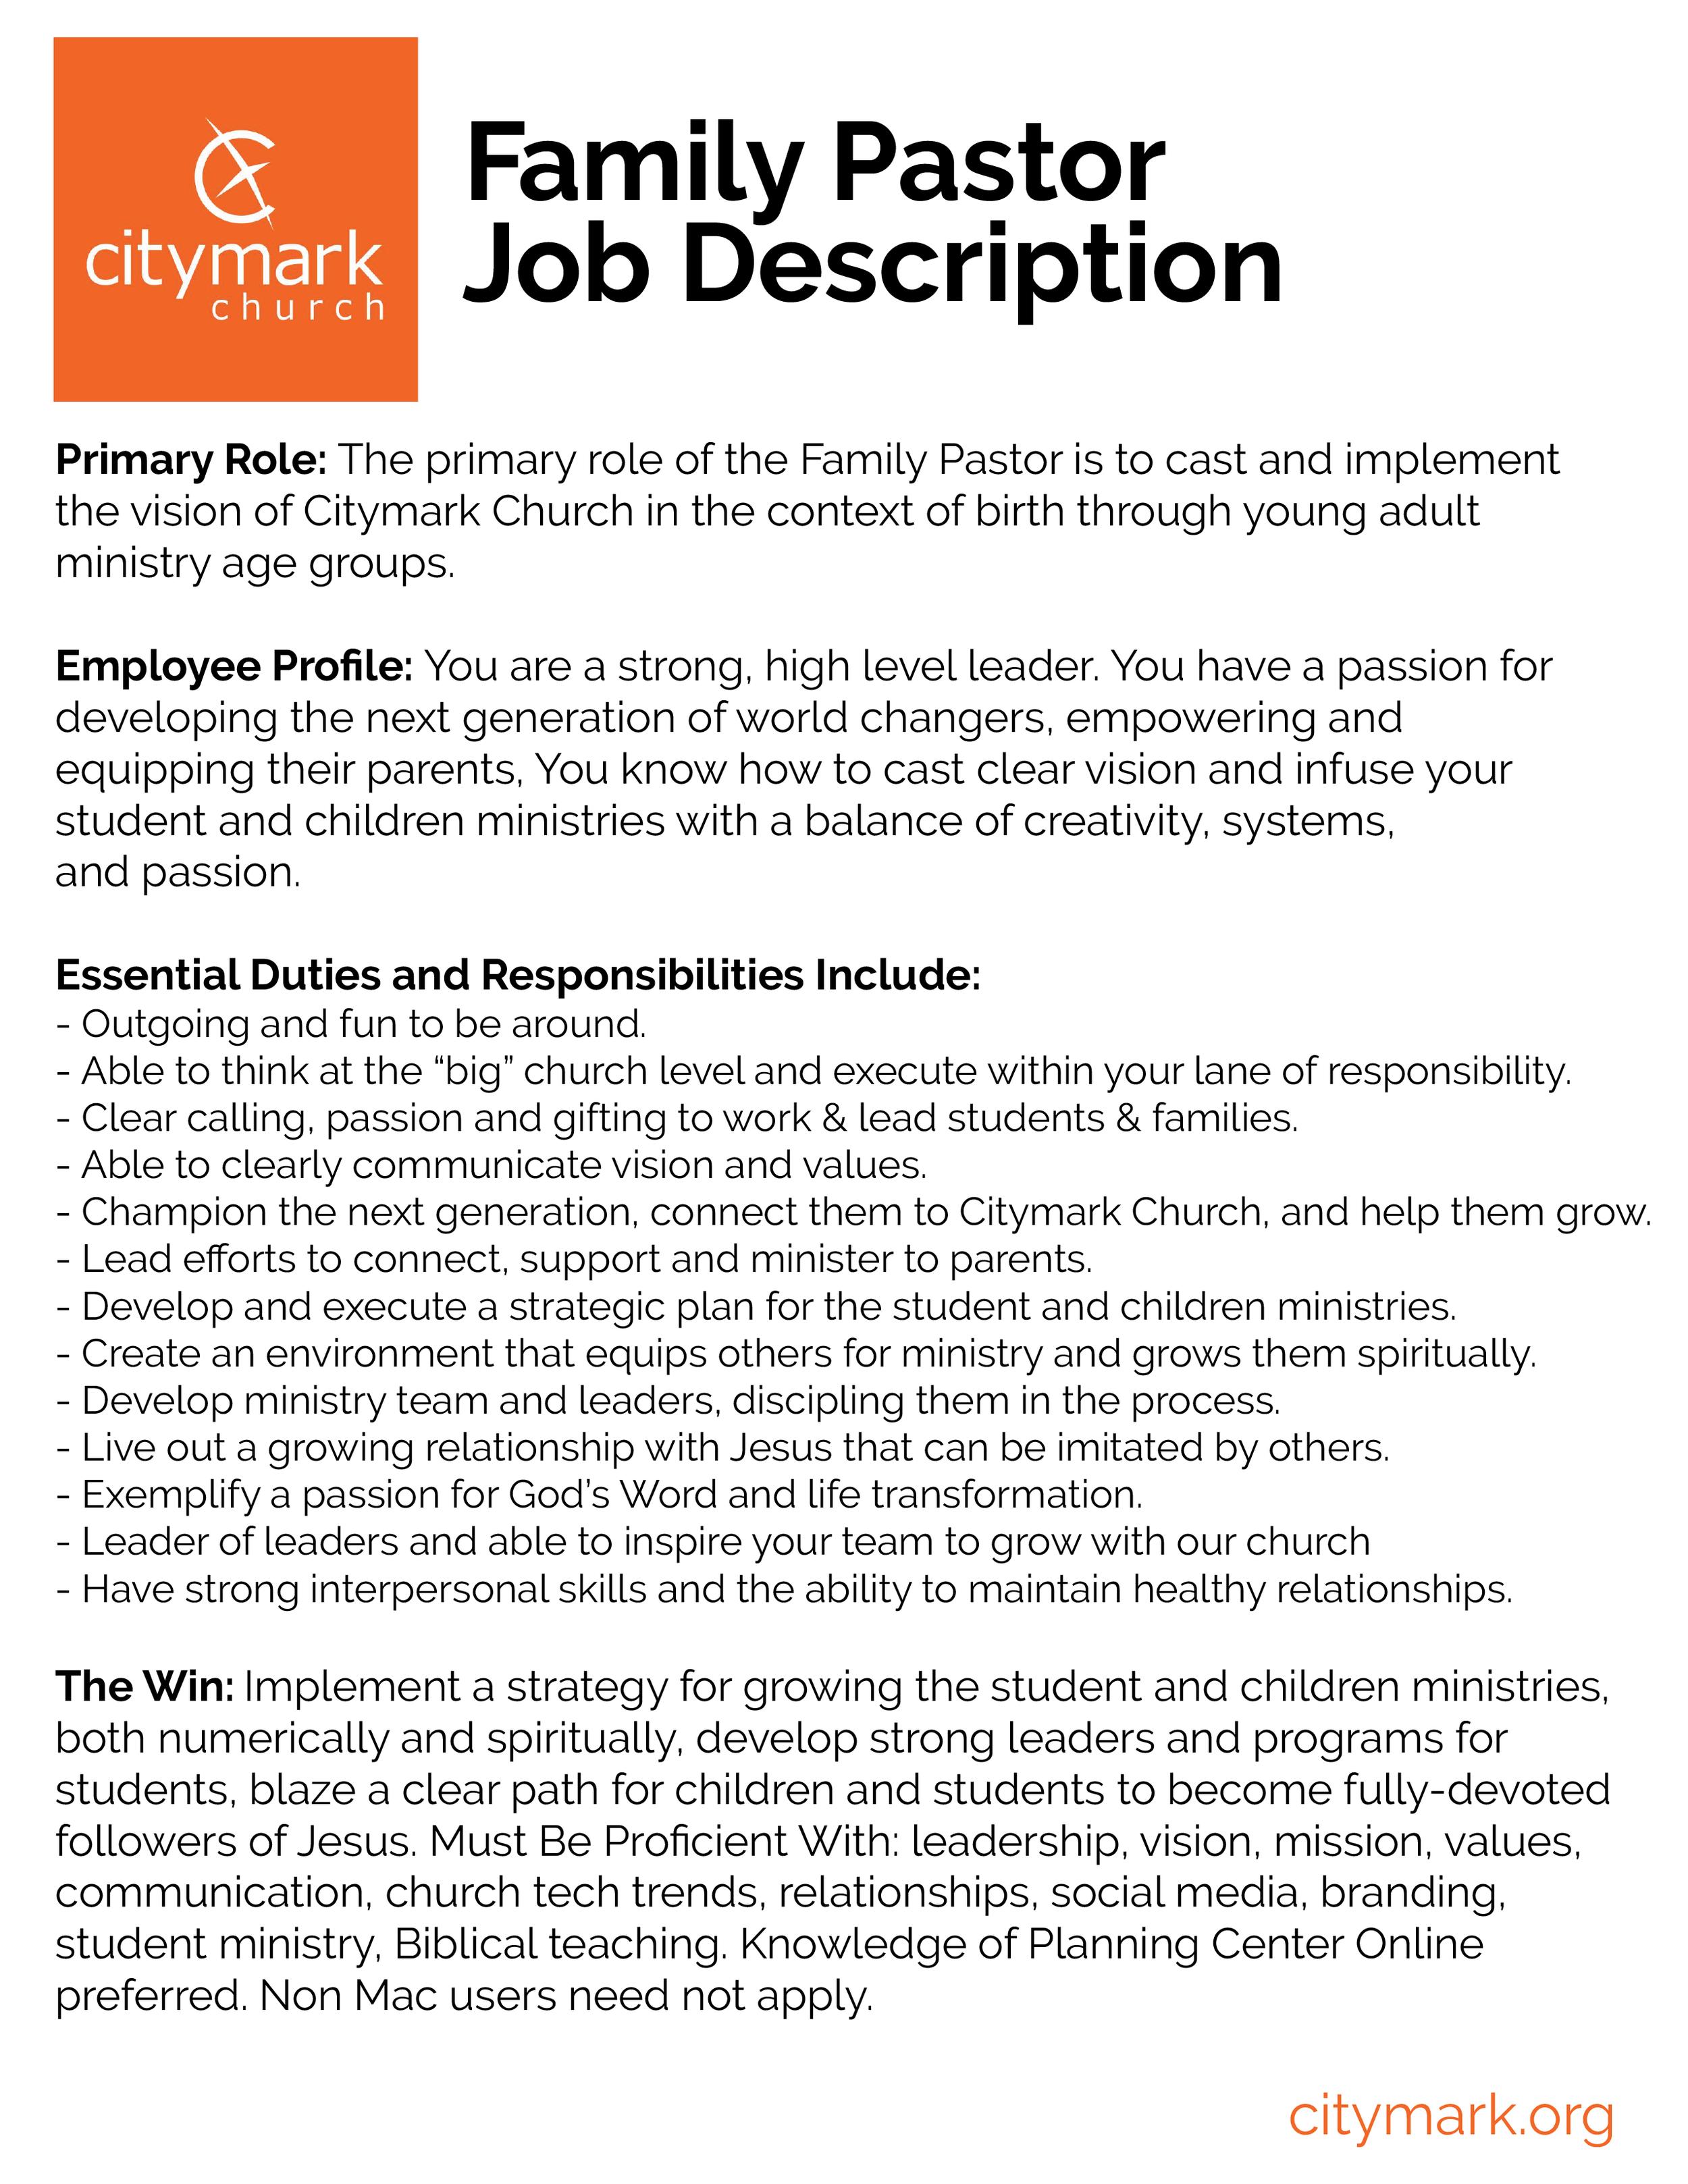 Citymark Family Pastor Job Description-01.png